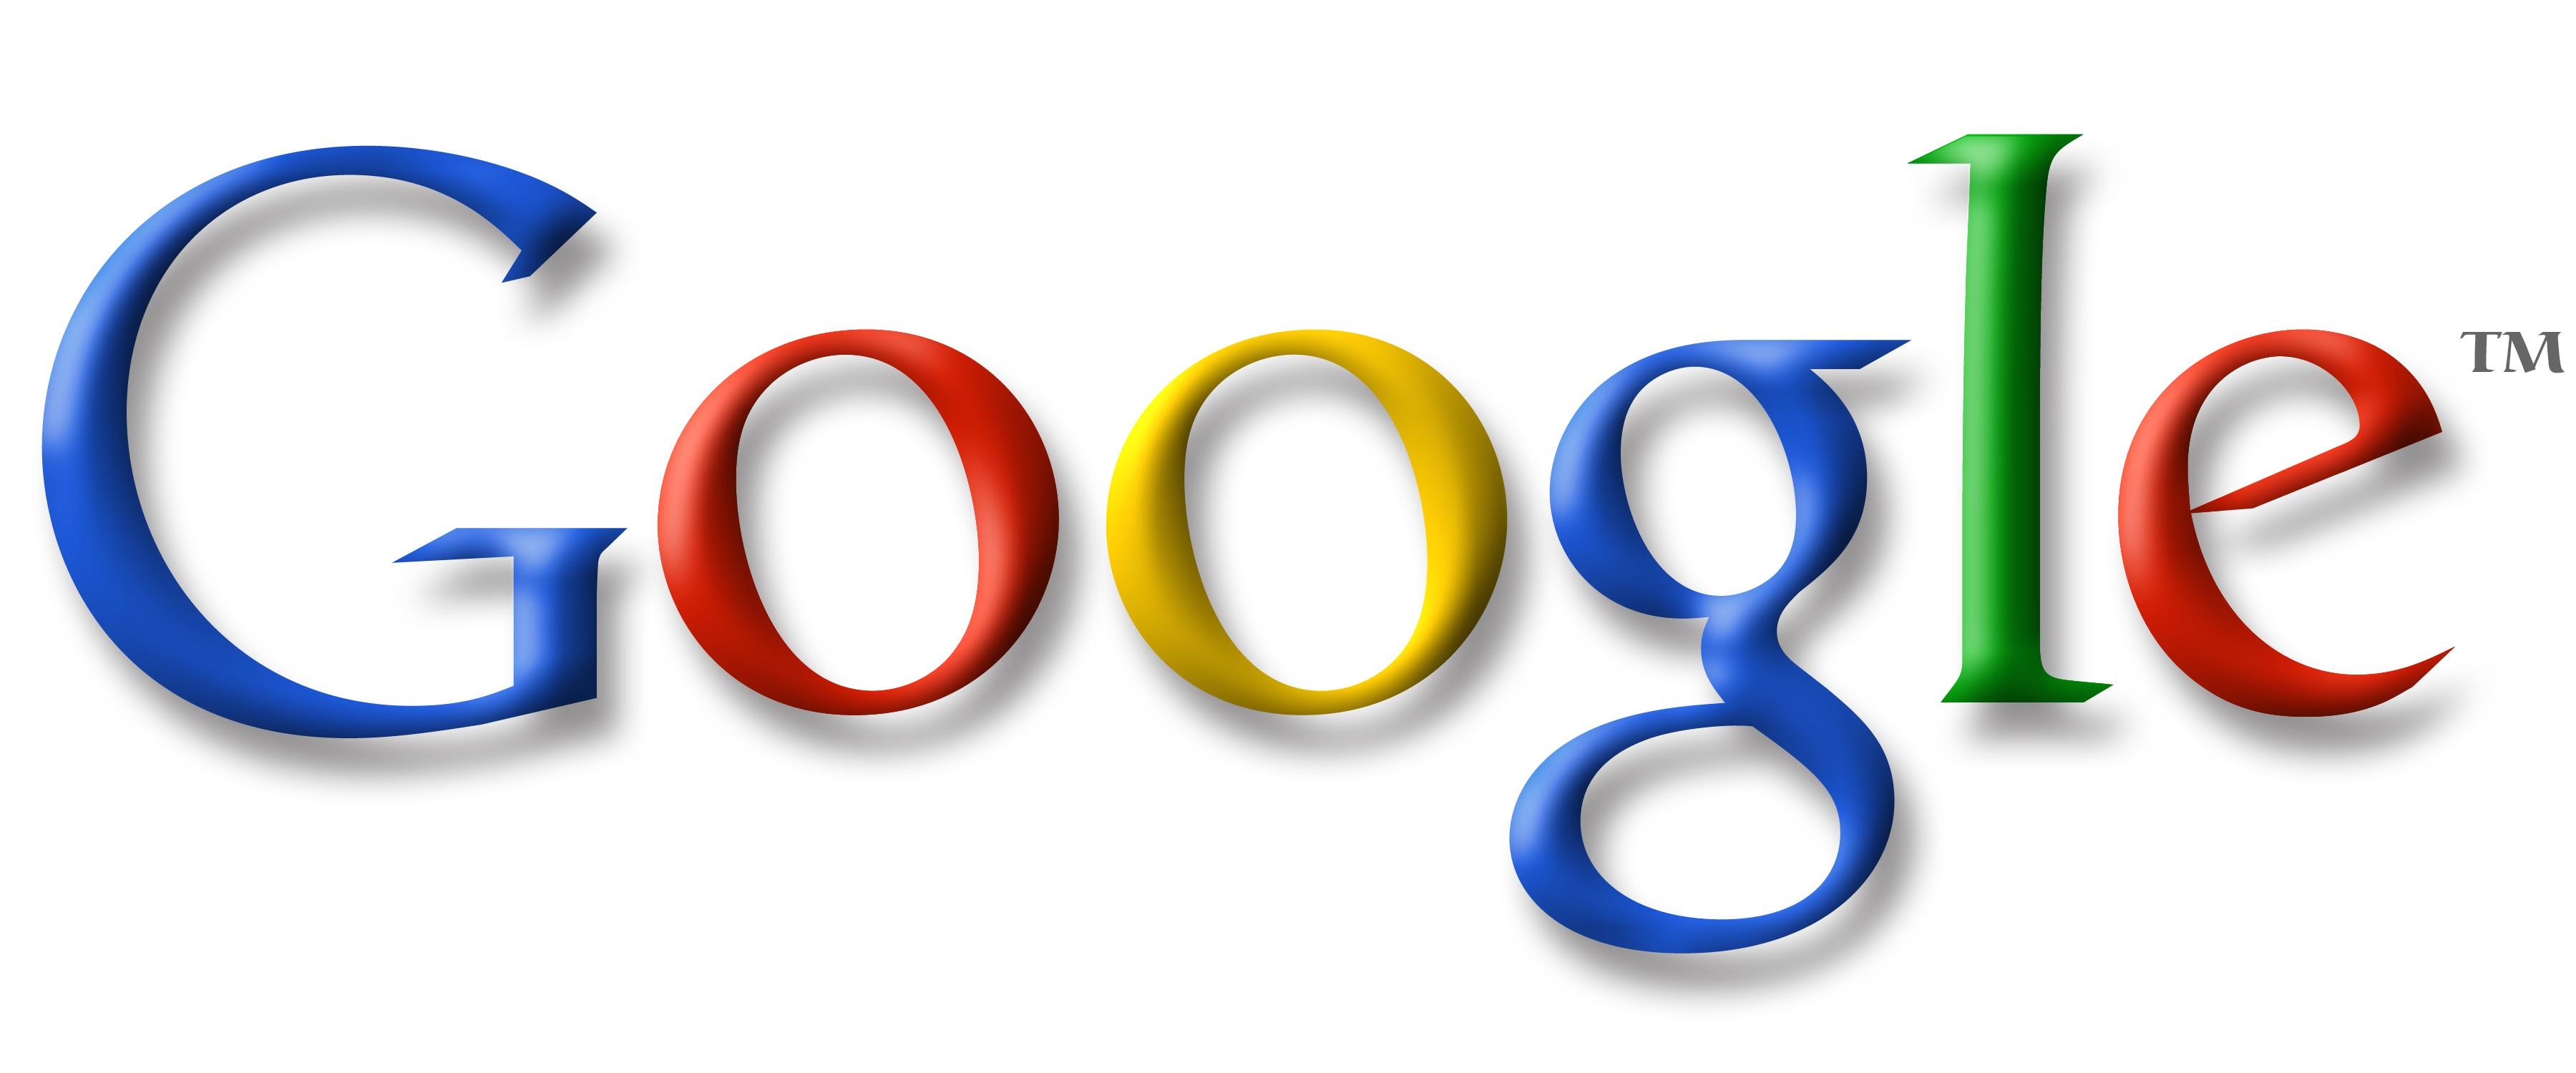 google_logo 2010